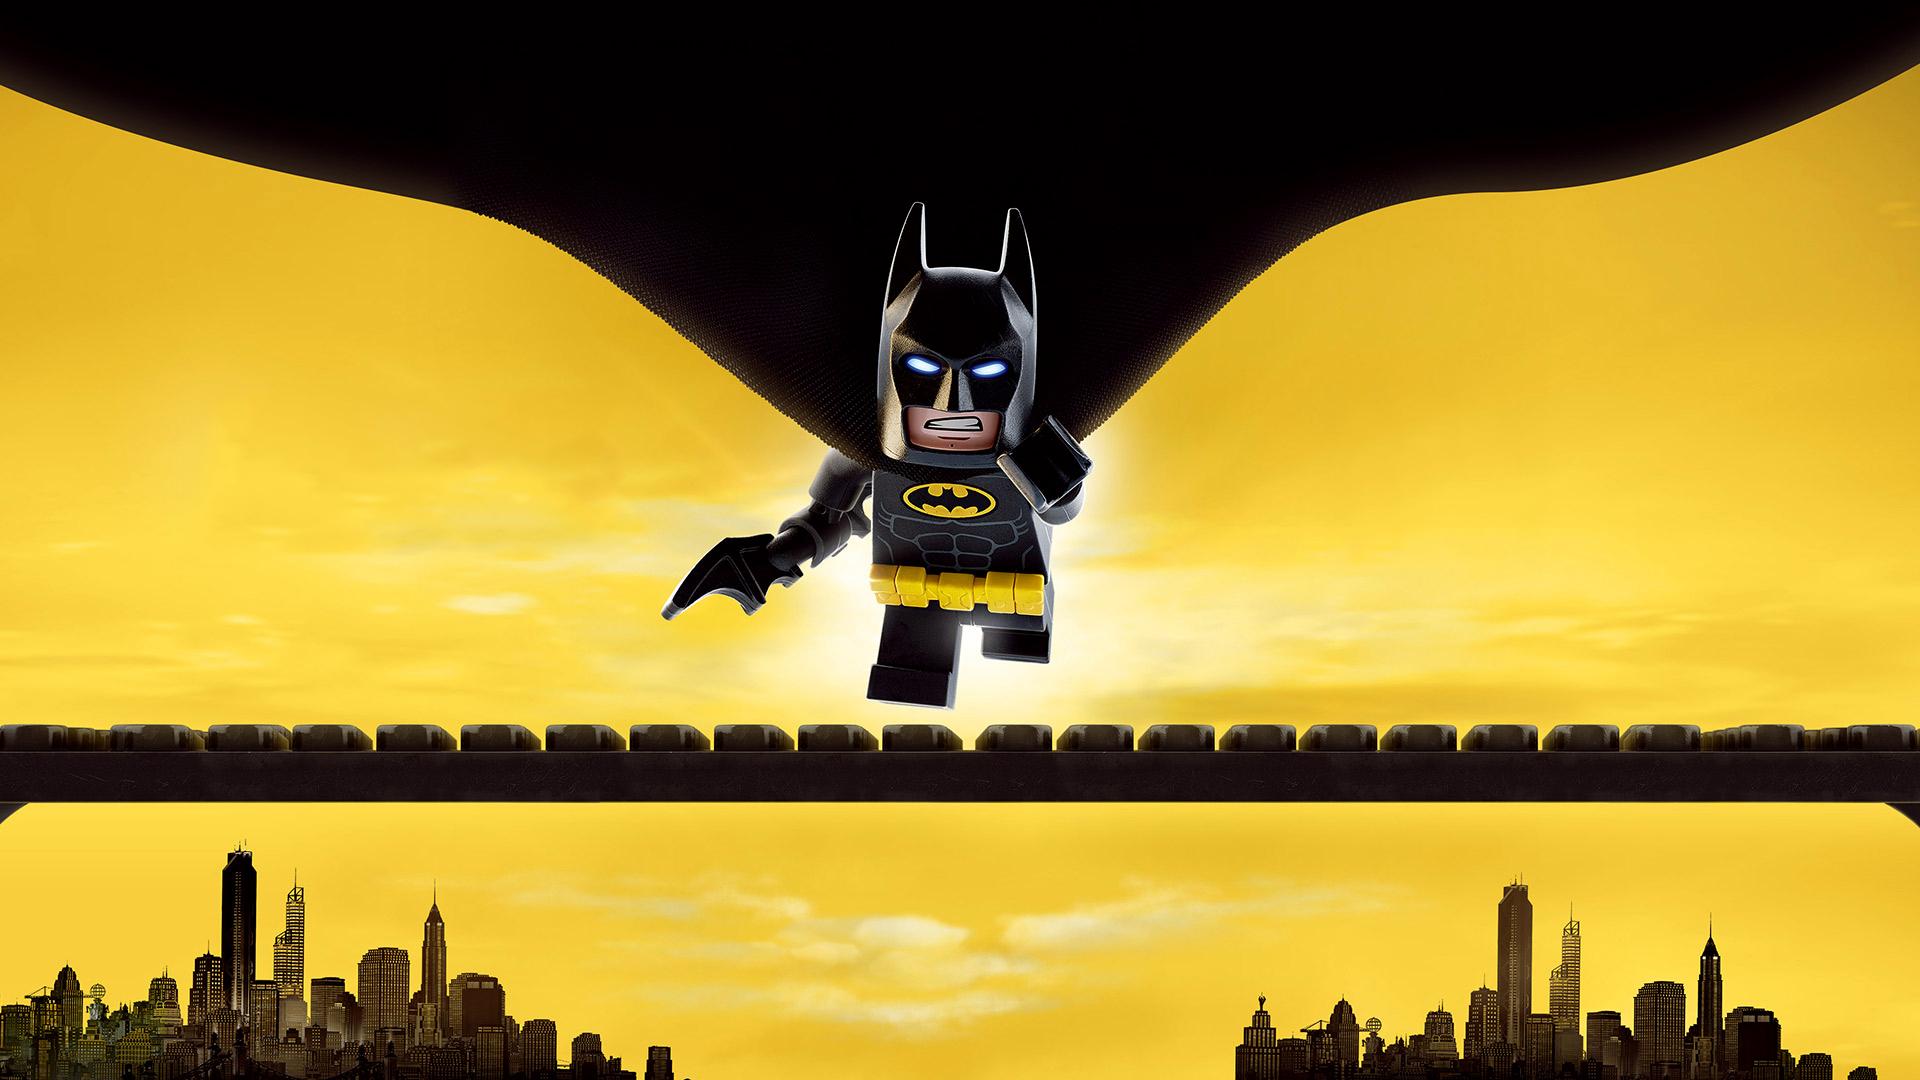 The Lego Batman Movie Papel De Parede HD